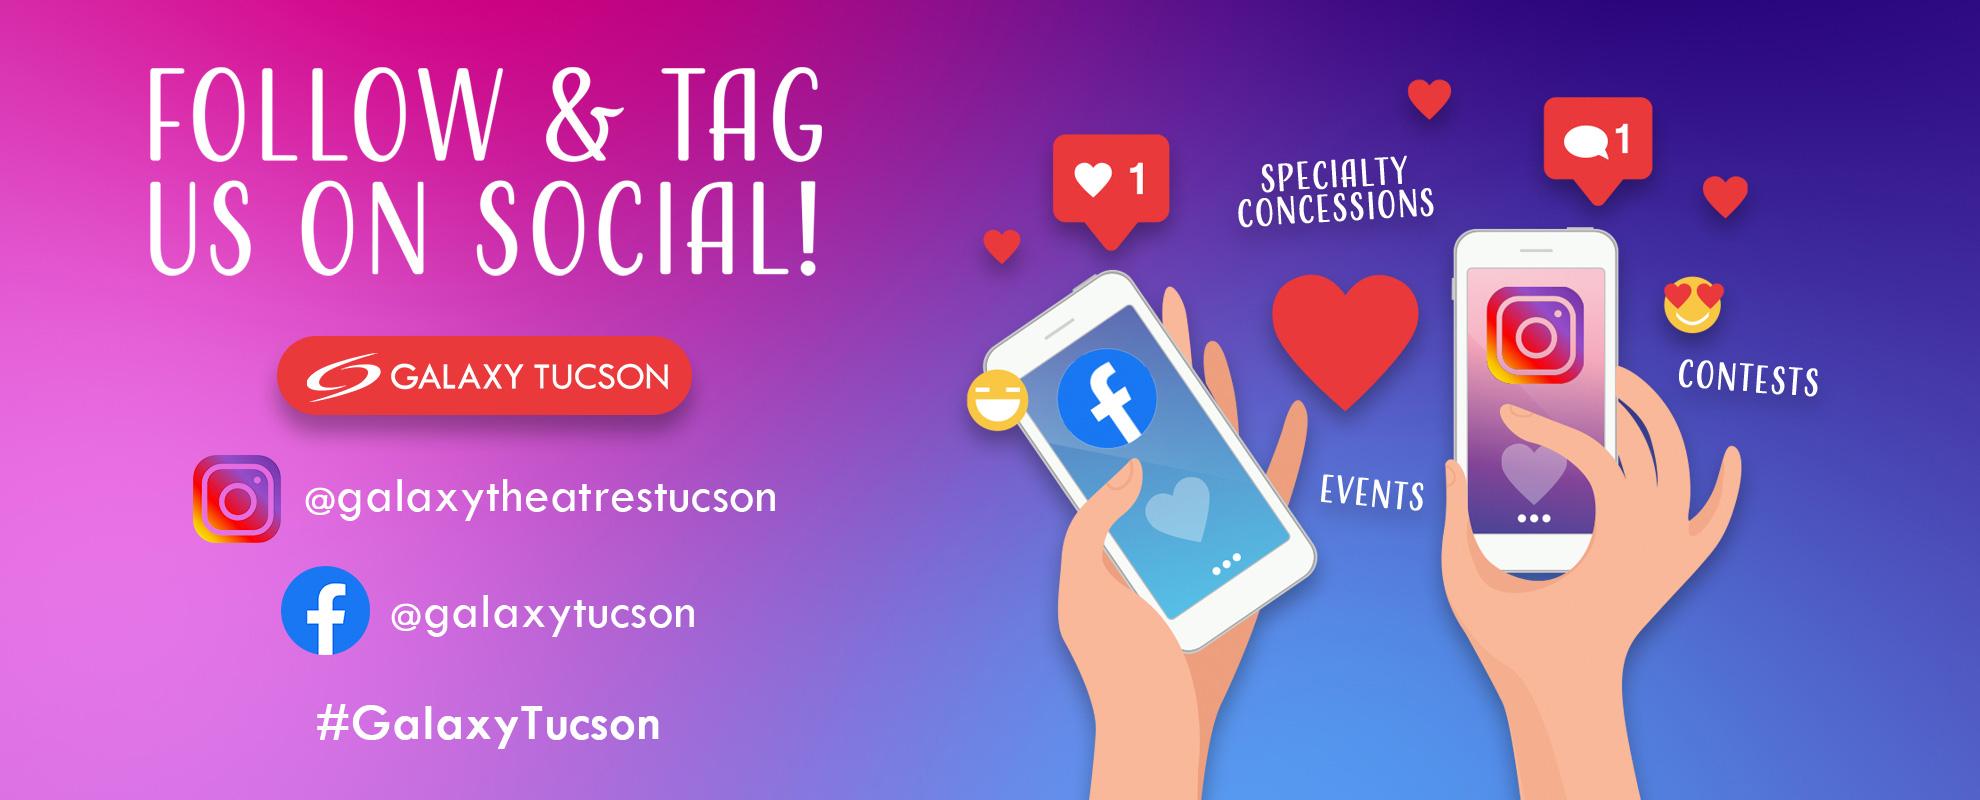 Socials/Hashtag - Tucson image